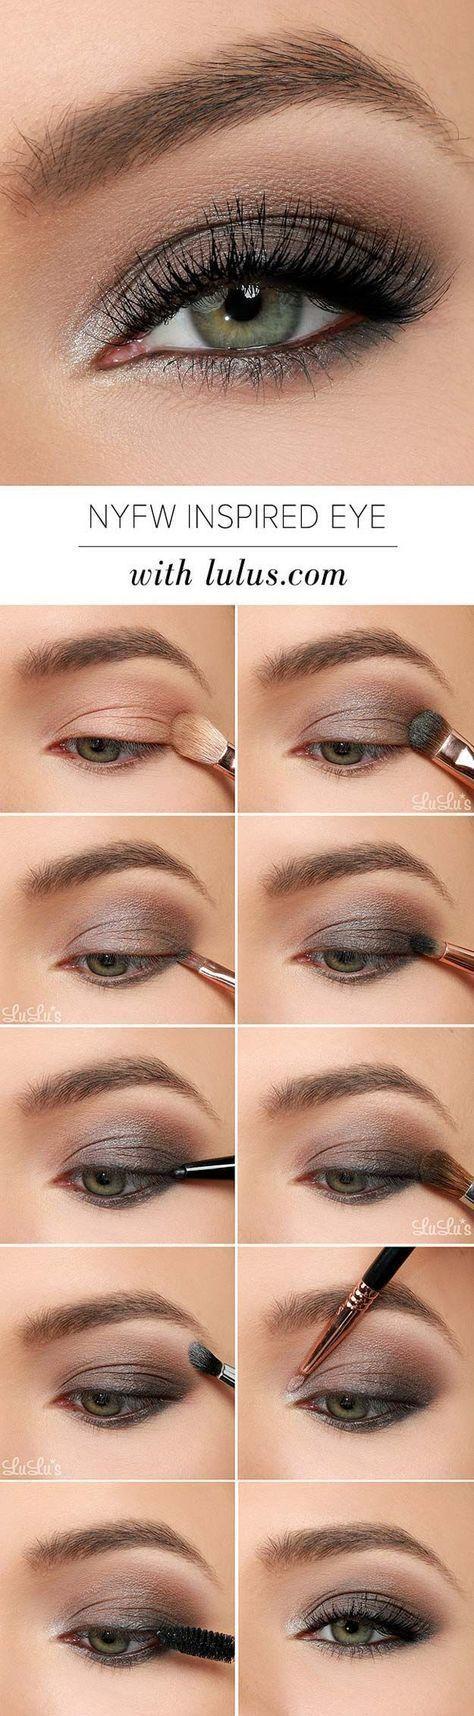 25 Best Eyeshadow Tutorials Ever Created –  Best Eyeshadow Tutorials – NYFW In…